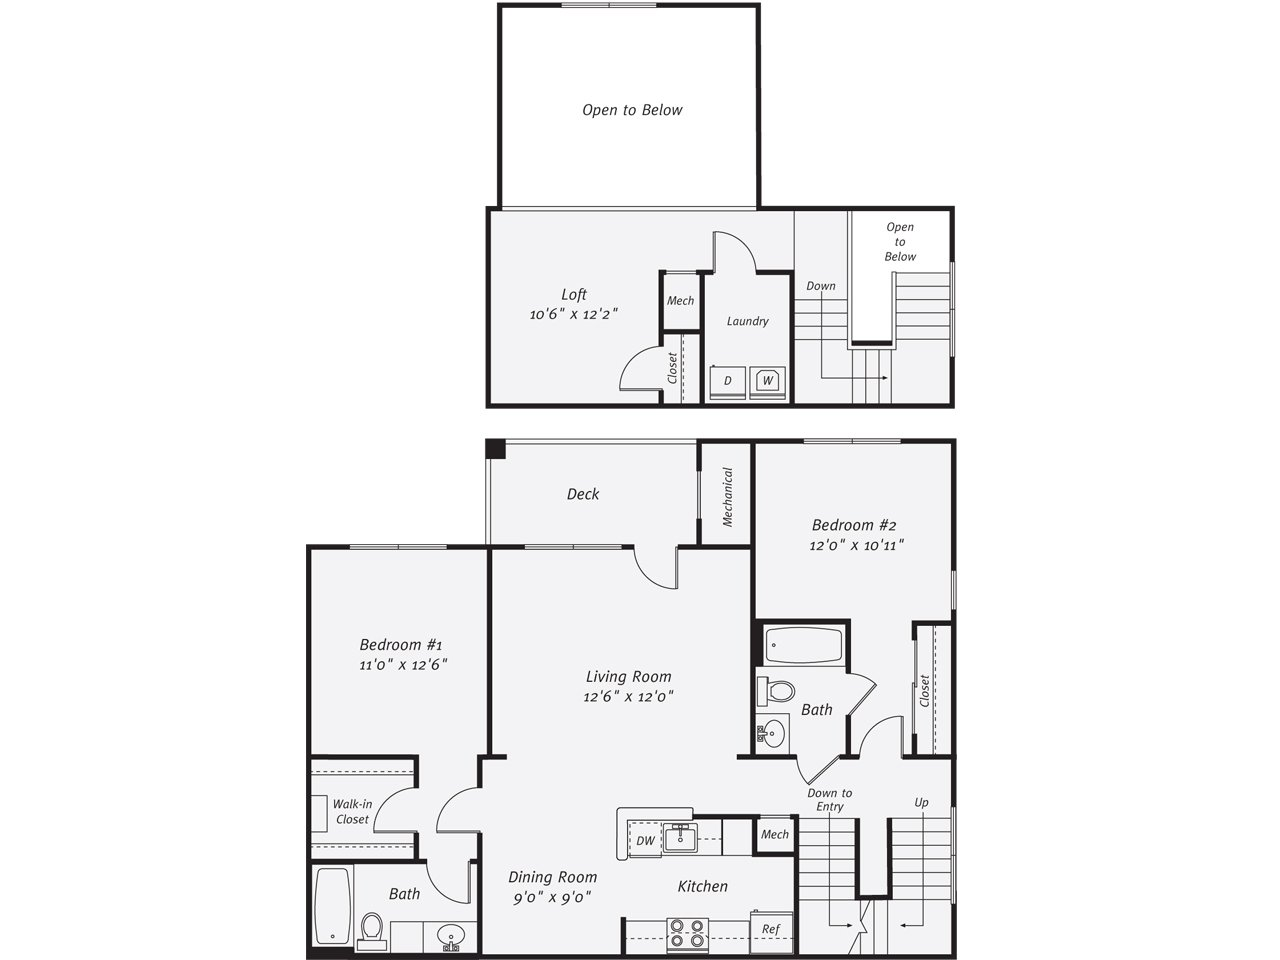 Ny coram thepointatpineridge p0571769 ny014 b11lg 2 floorplan